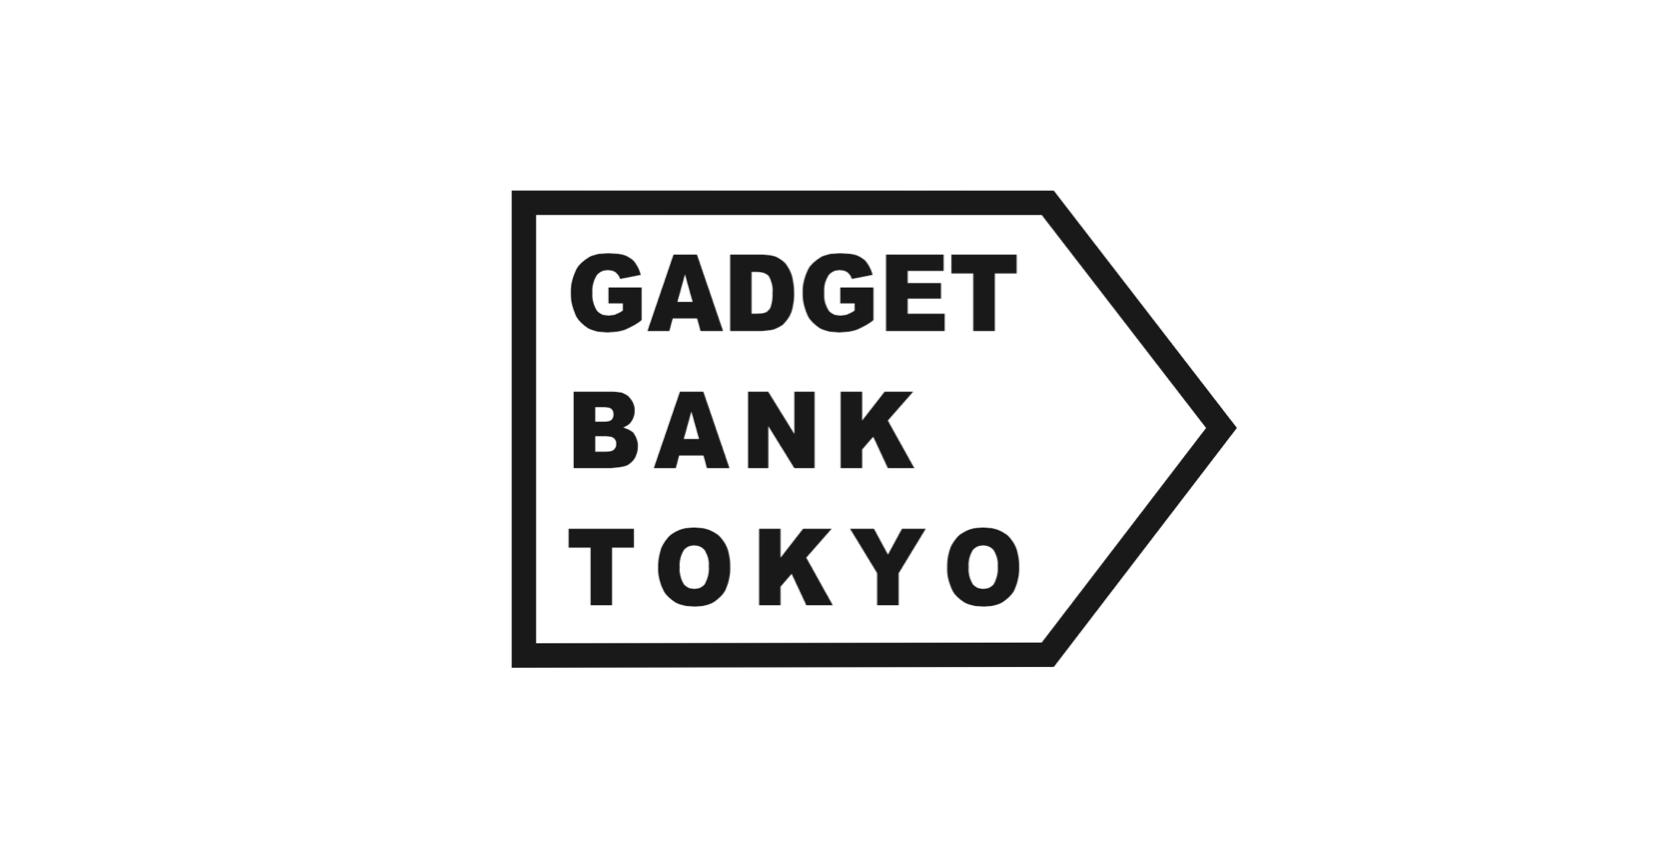 GADGET BANK TOKYO